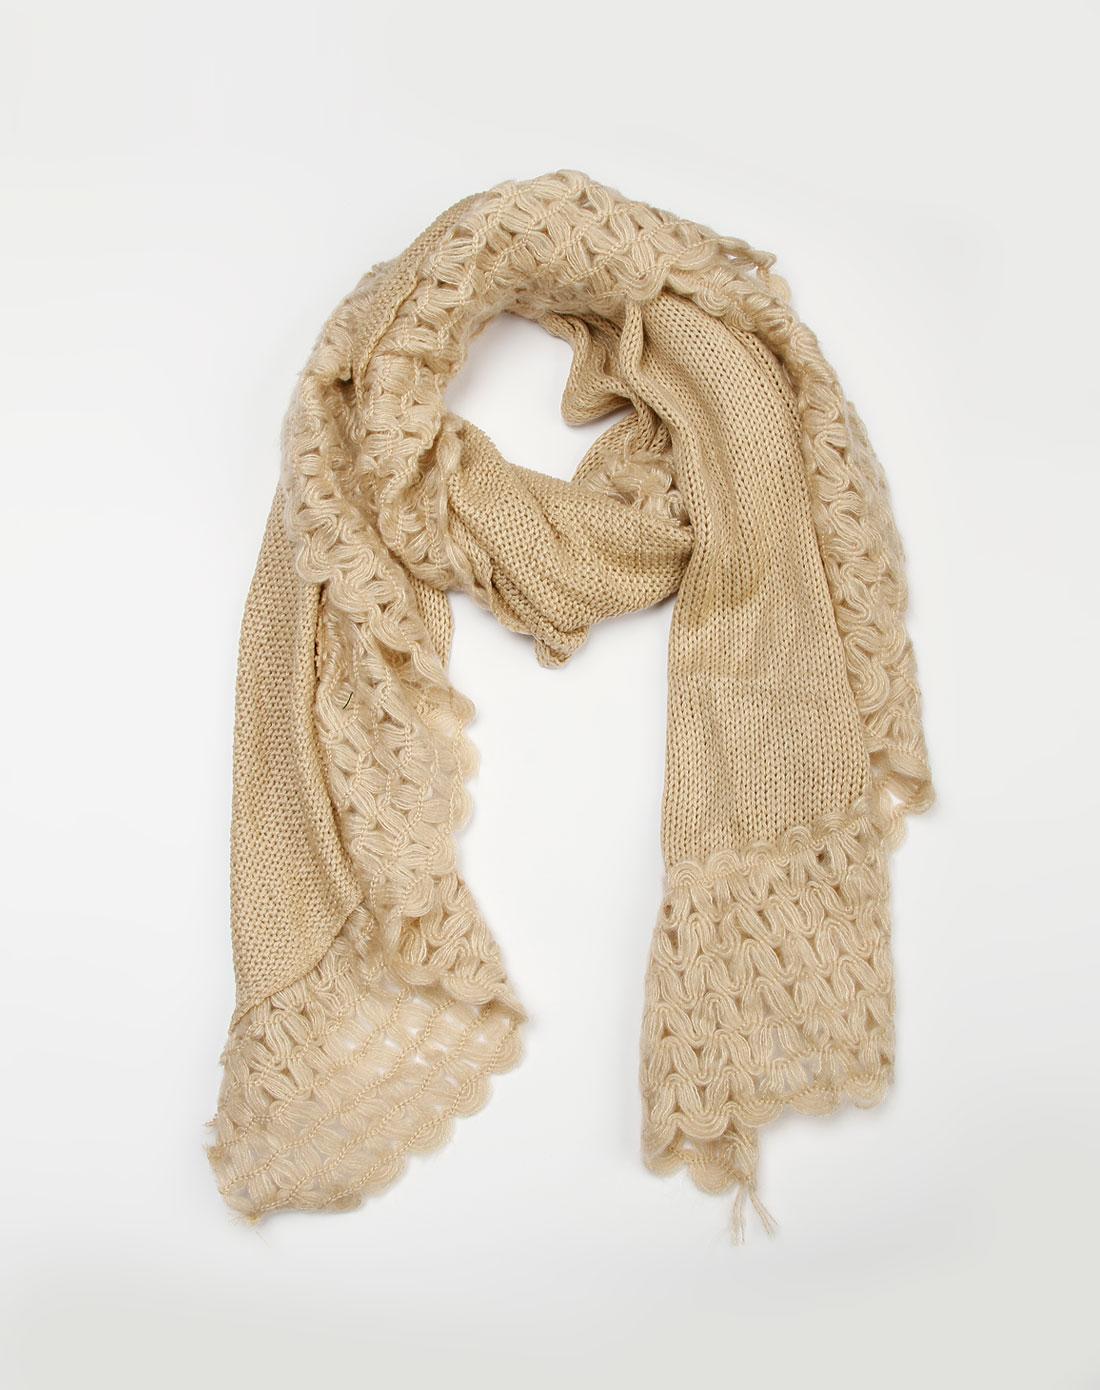 奥美嘉米色围巾029022